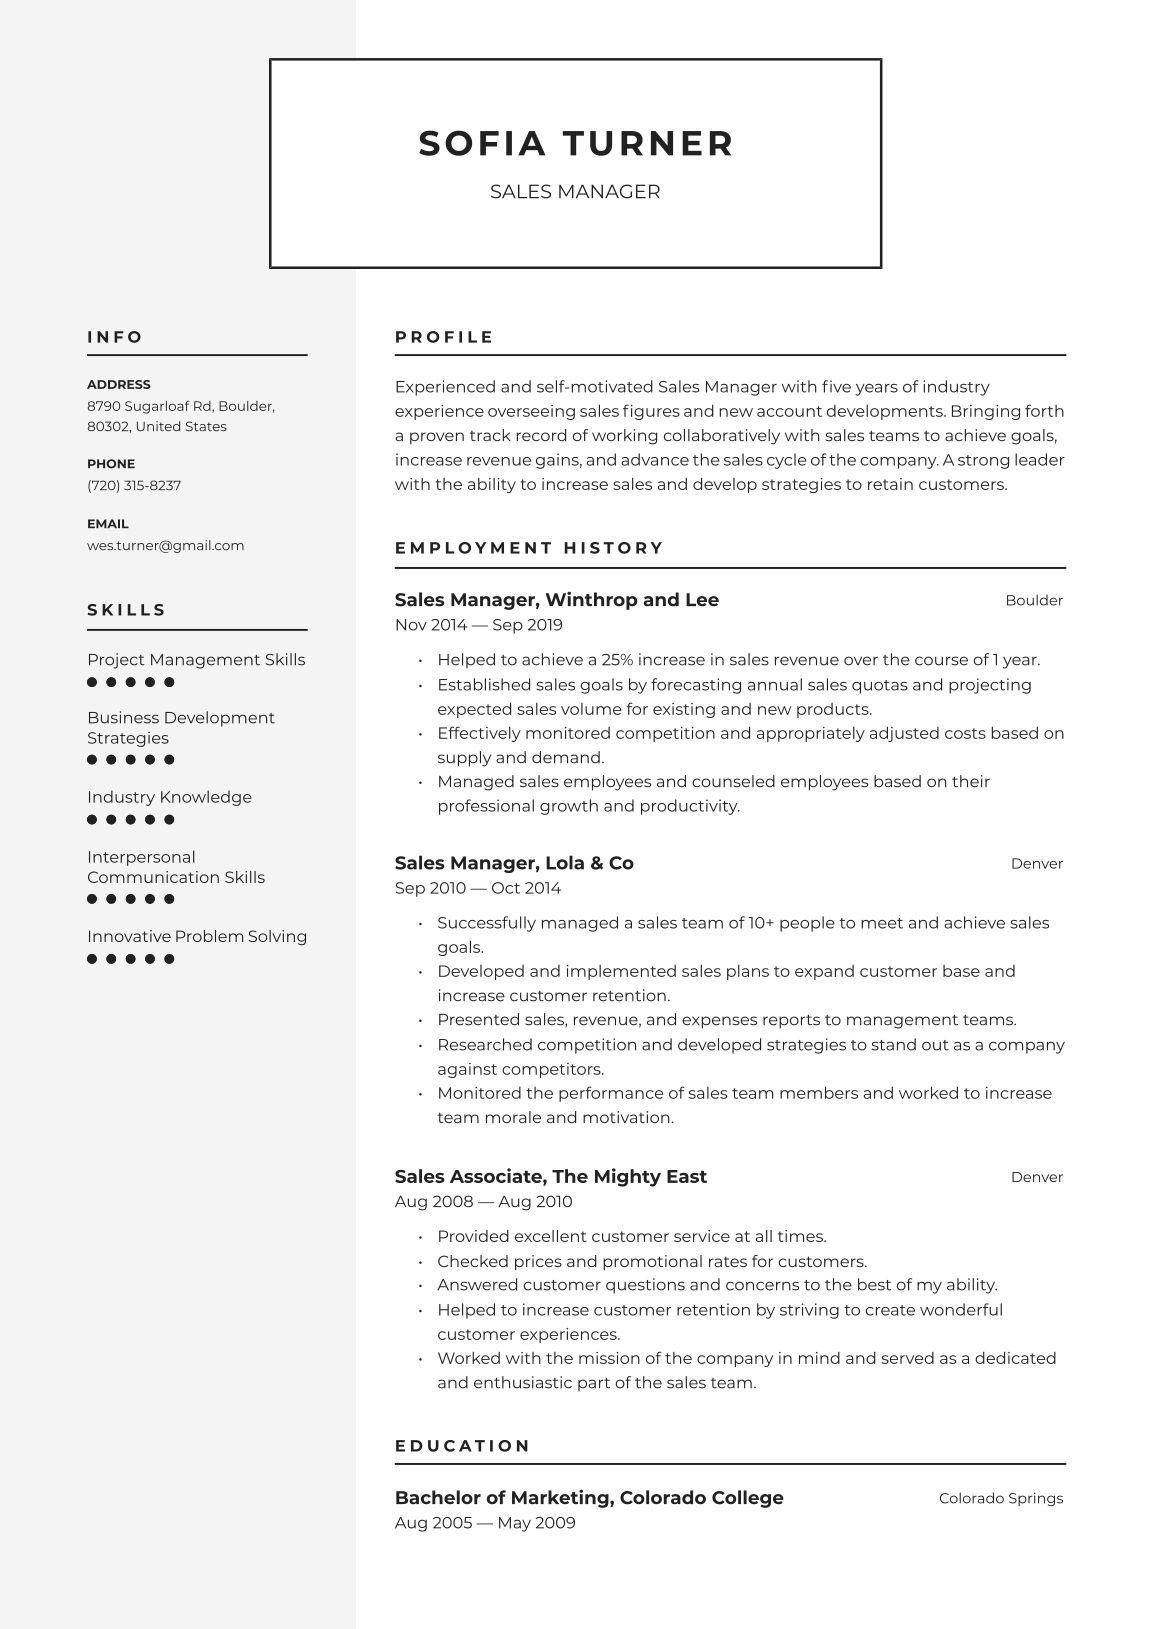 Resume Builder Resume Io Customer Service Resume Examples Free Resume Maker Customer Service Resume